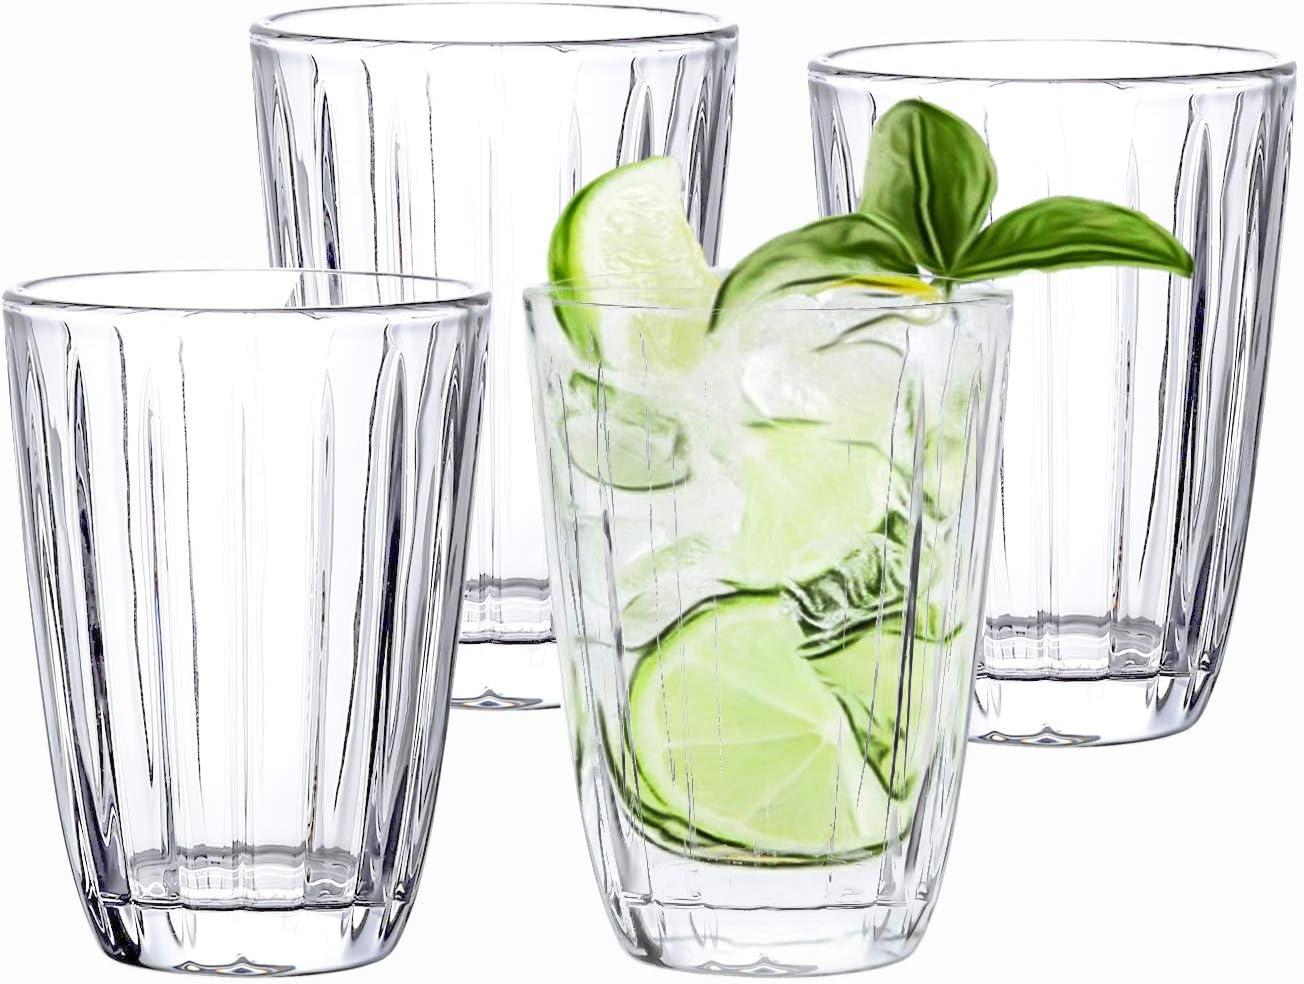 Kingrol 4 Pack Embossed Drinking Glasses, 11.5 oz Romantic Water Glassware, Glass Tumbler Set for Juice, Beverages, Beer, Cocktail, Mixed Drinks